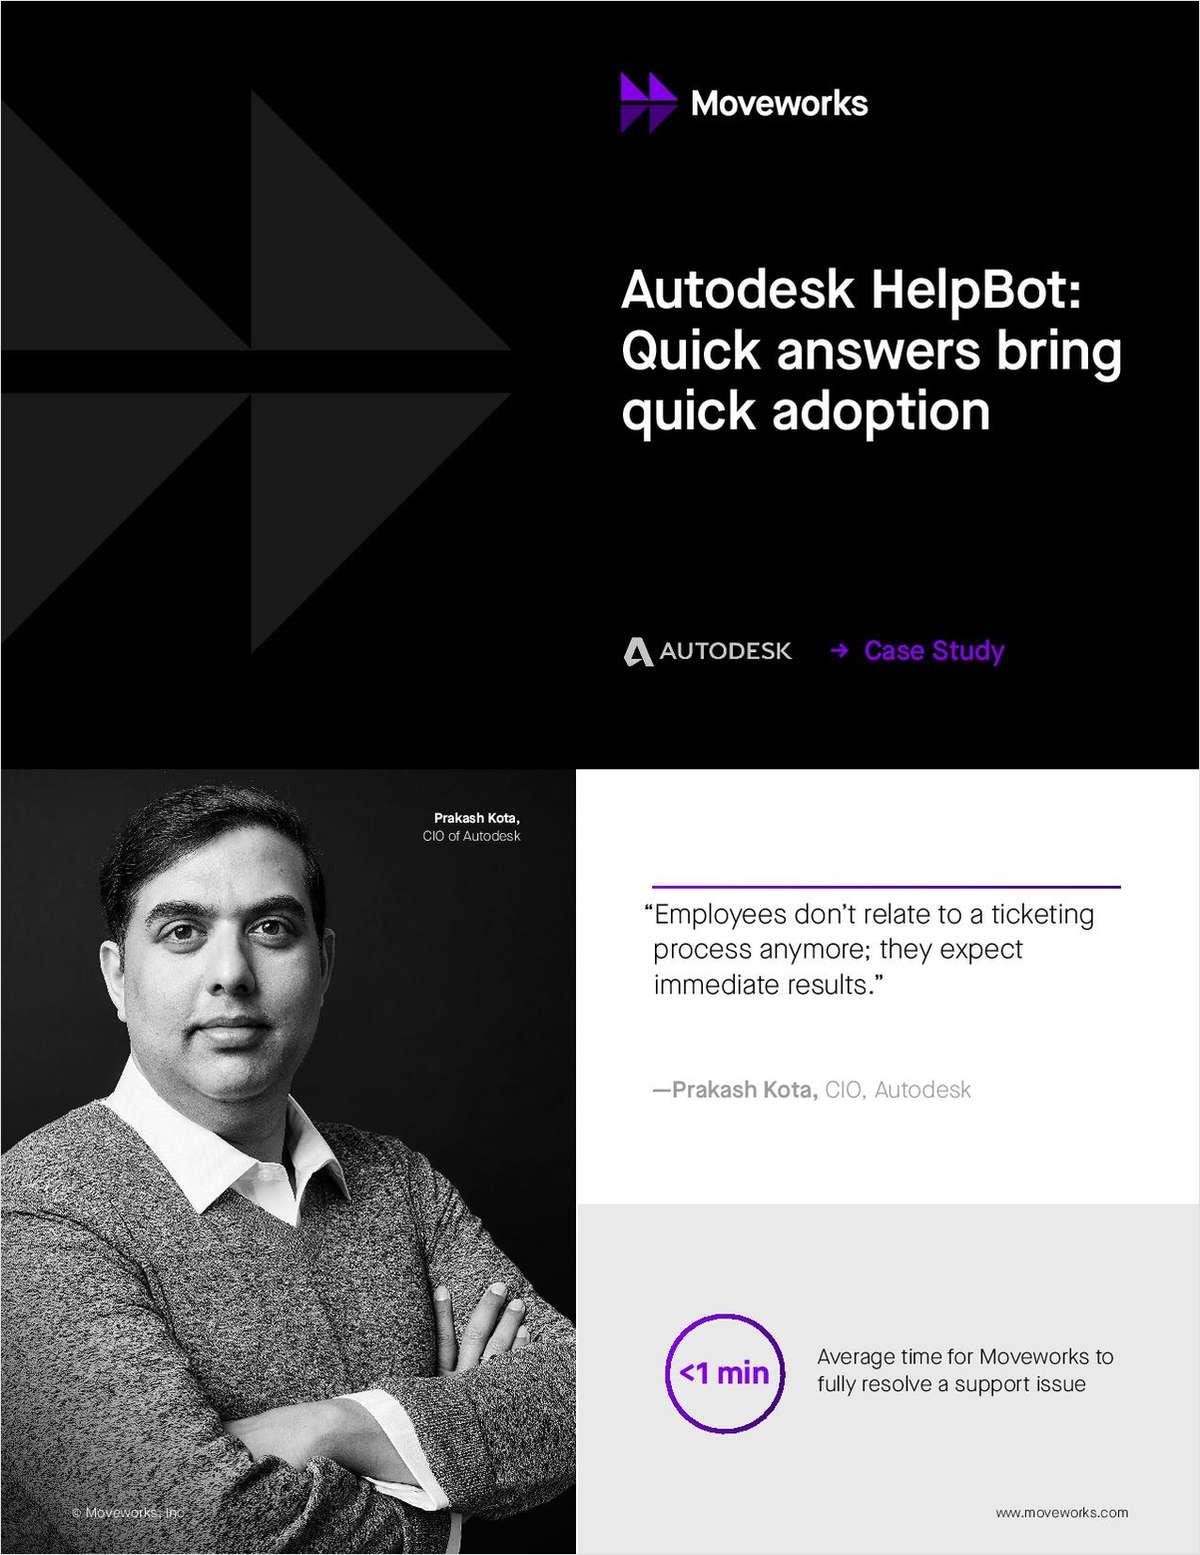 Autodesk IT Support HelpBot